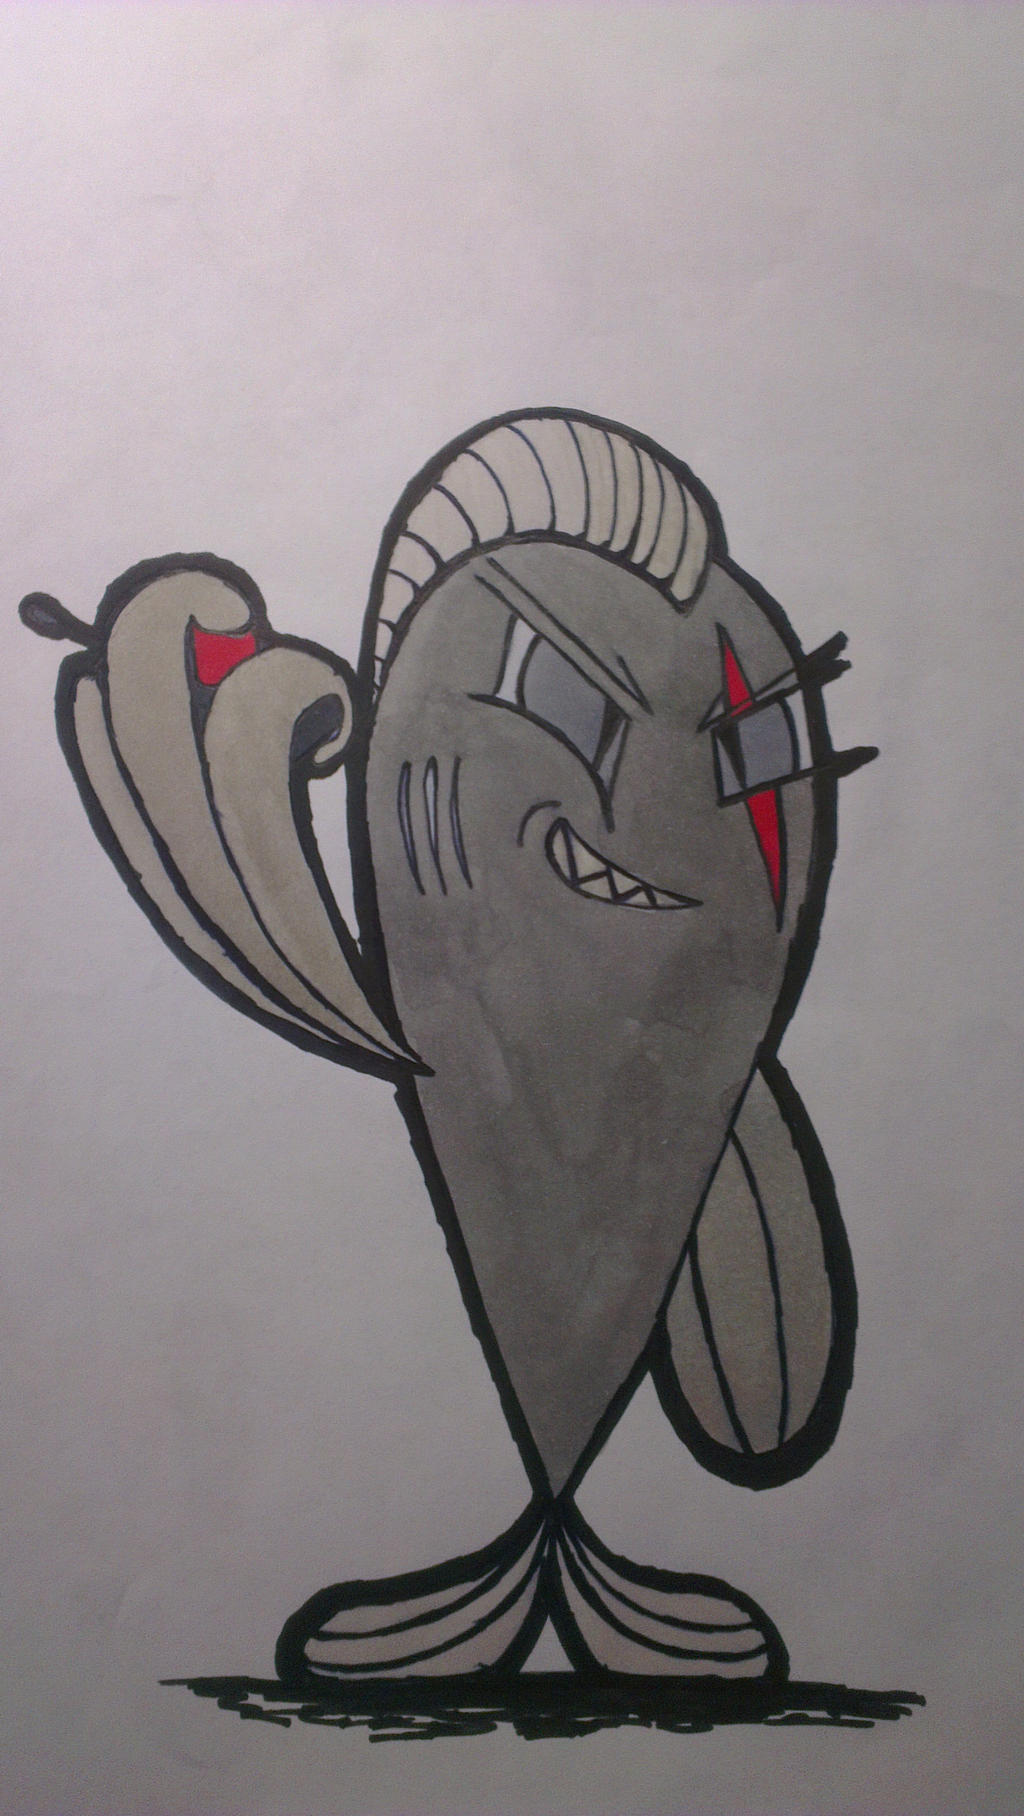 BrandonTheFish by CritikalJari